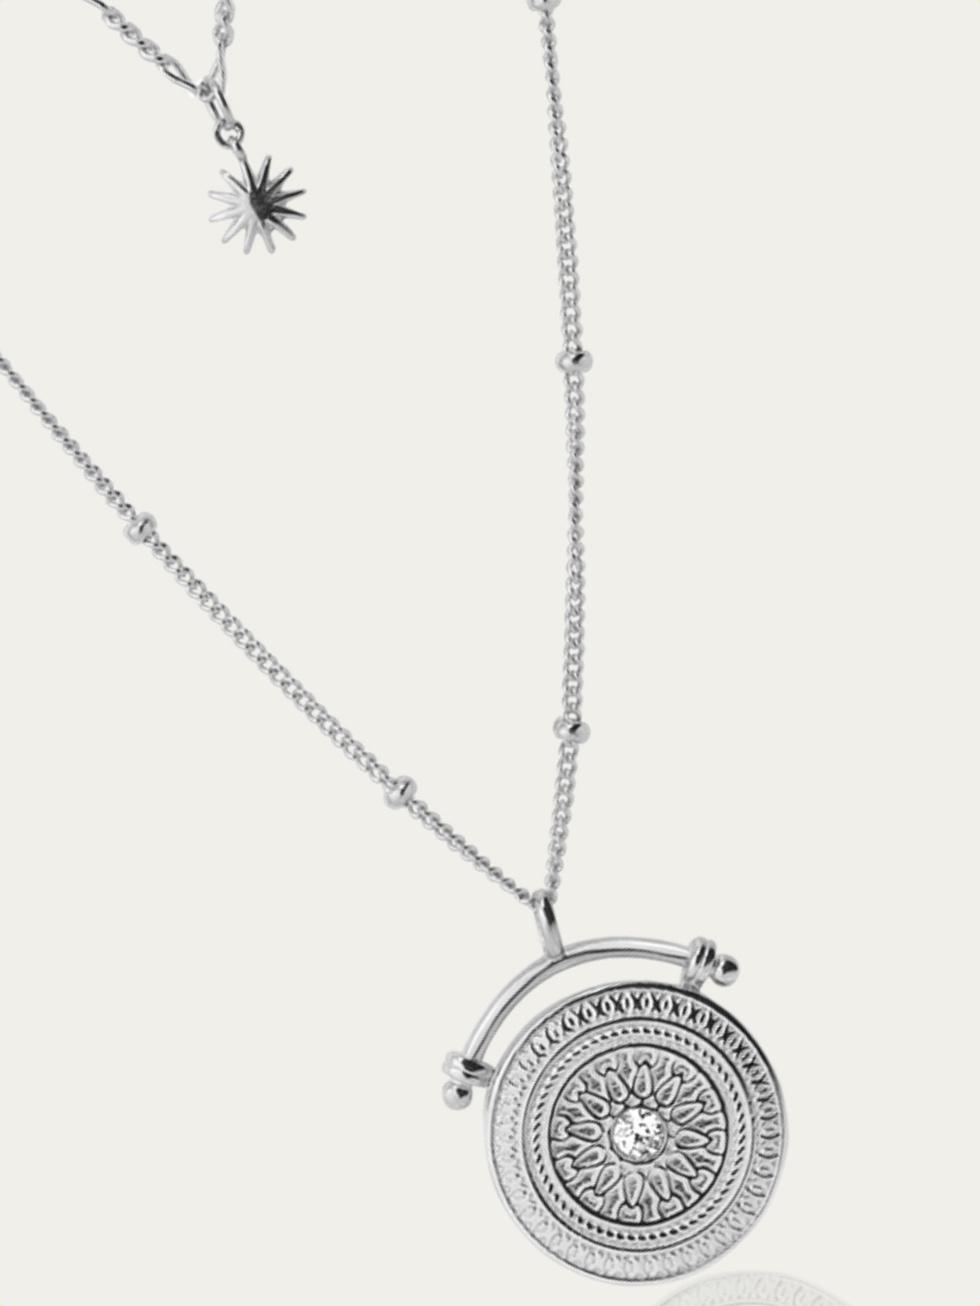 Collar amulet zomm